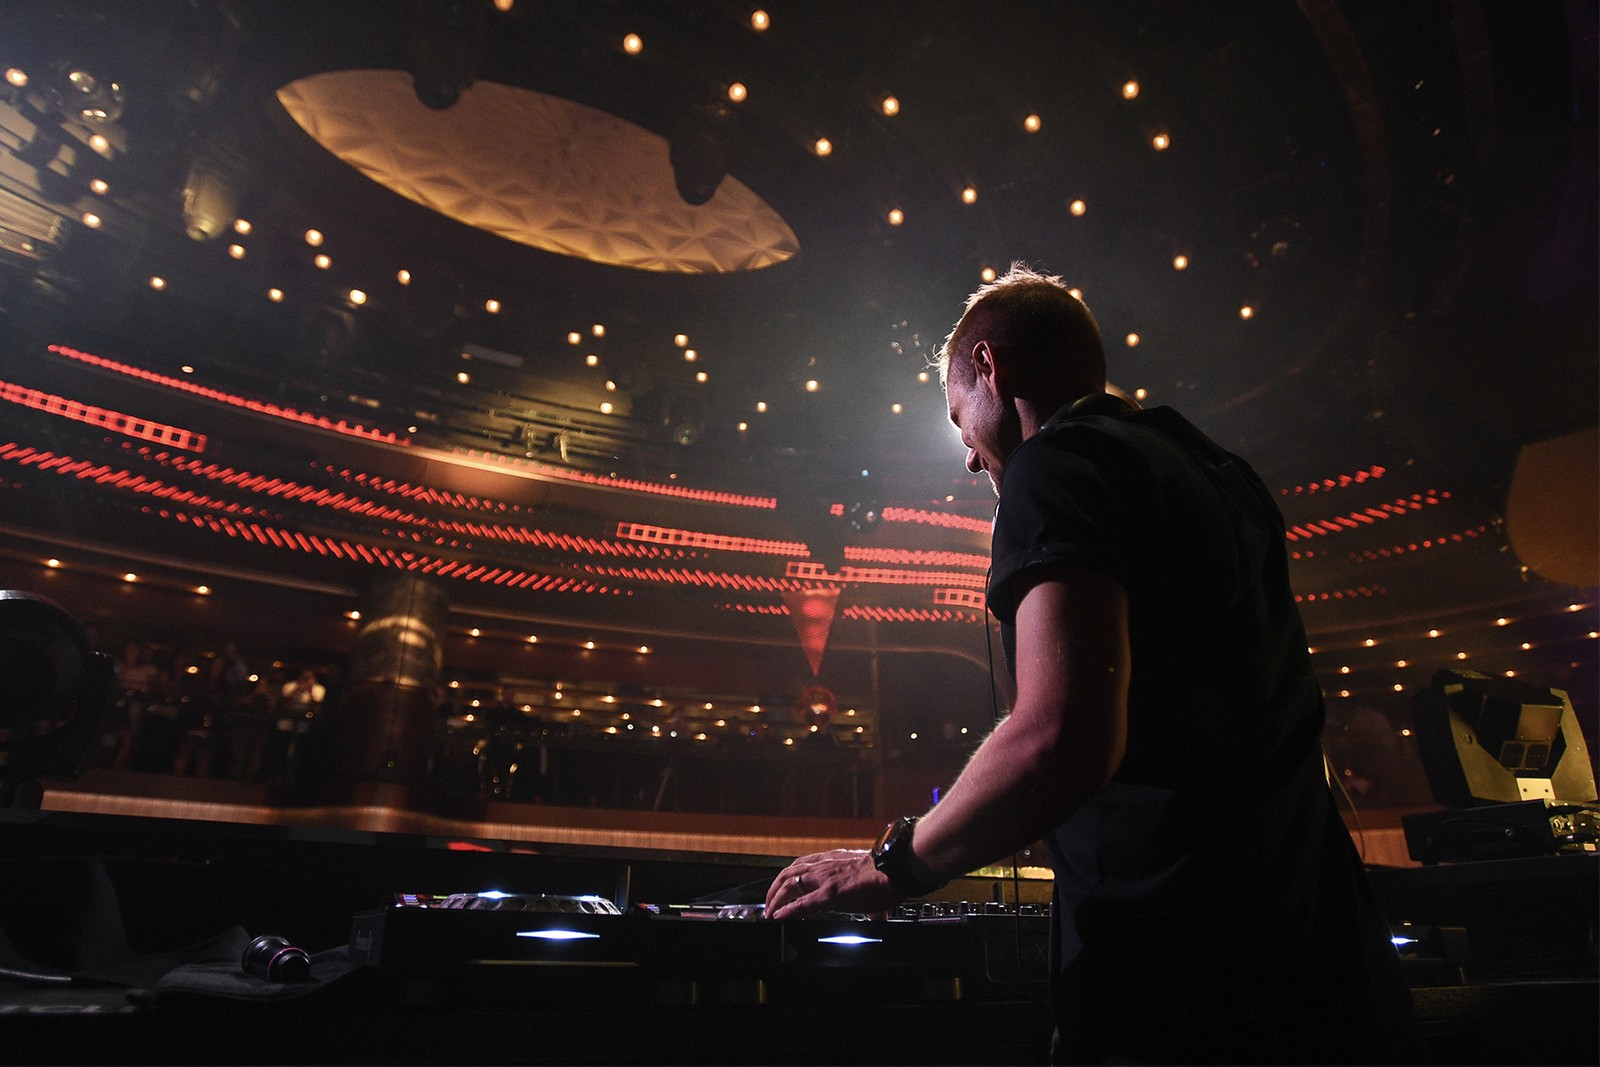 Armin Van Buuren Has an Unfaltering Love for Trance asot 950 jbl fest 2019 live performance partnership interview las vegas nevada a state of trance balance